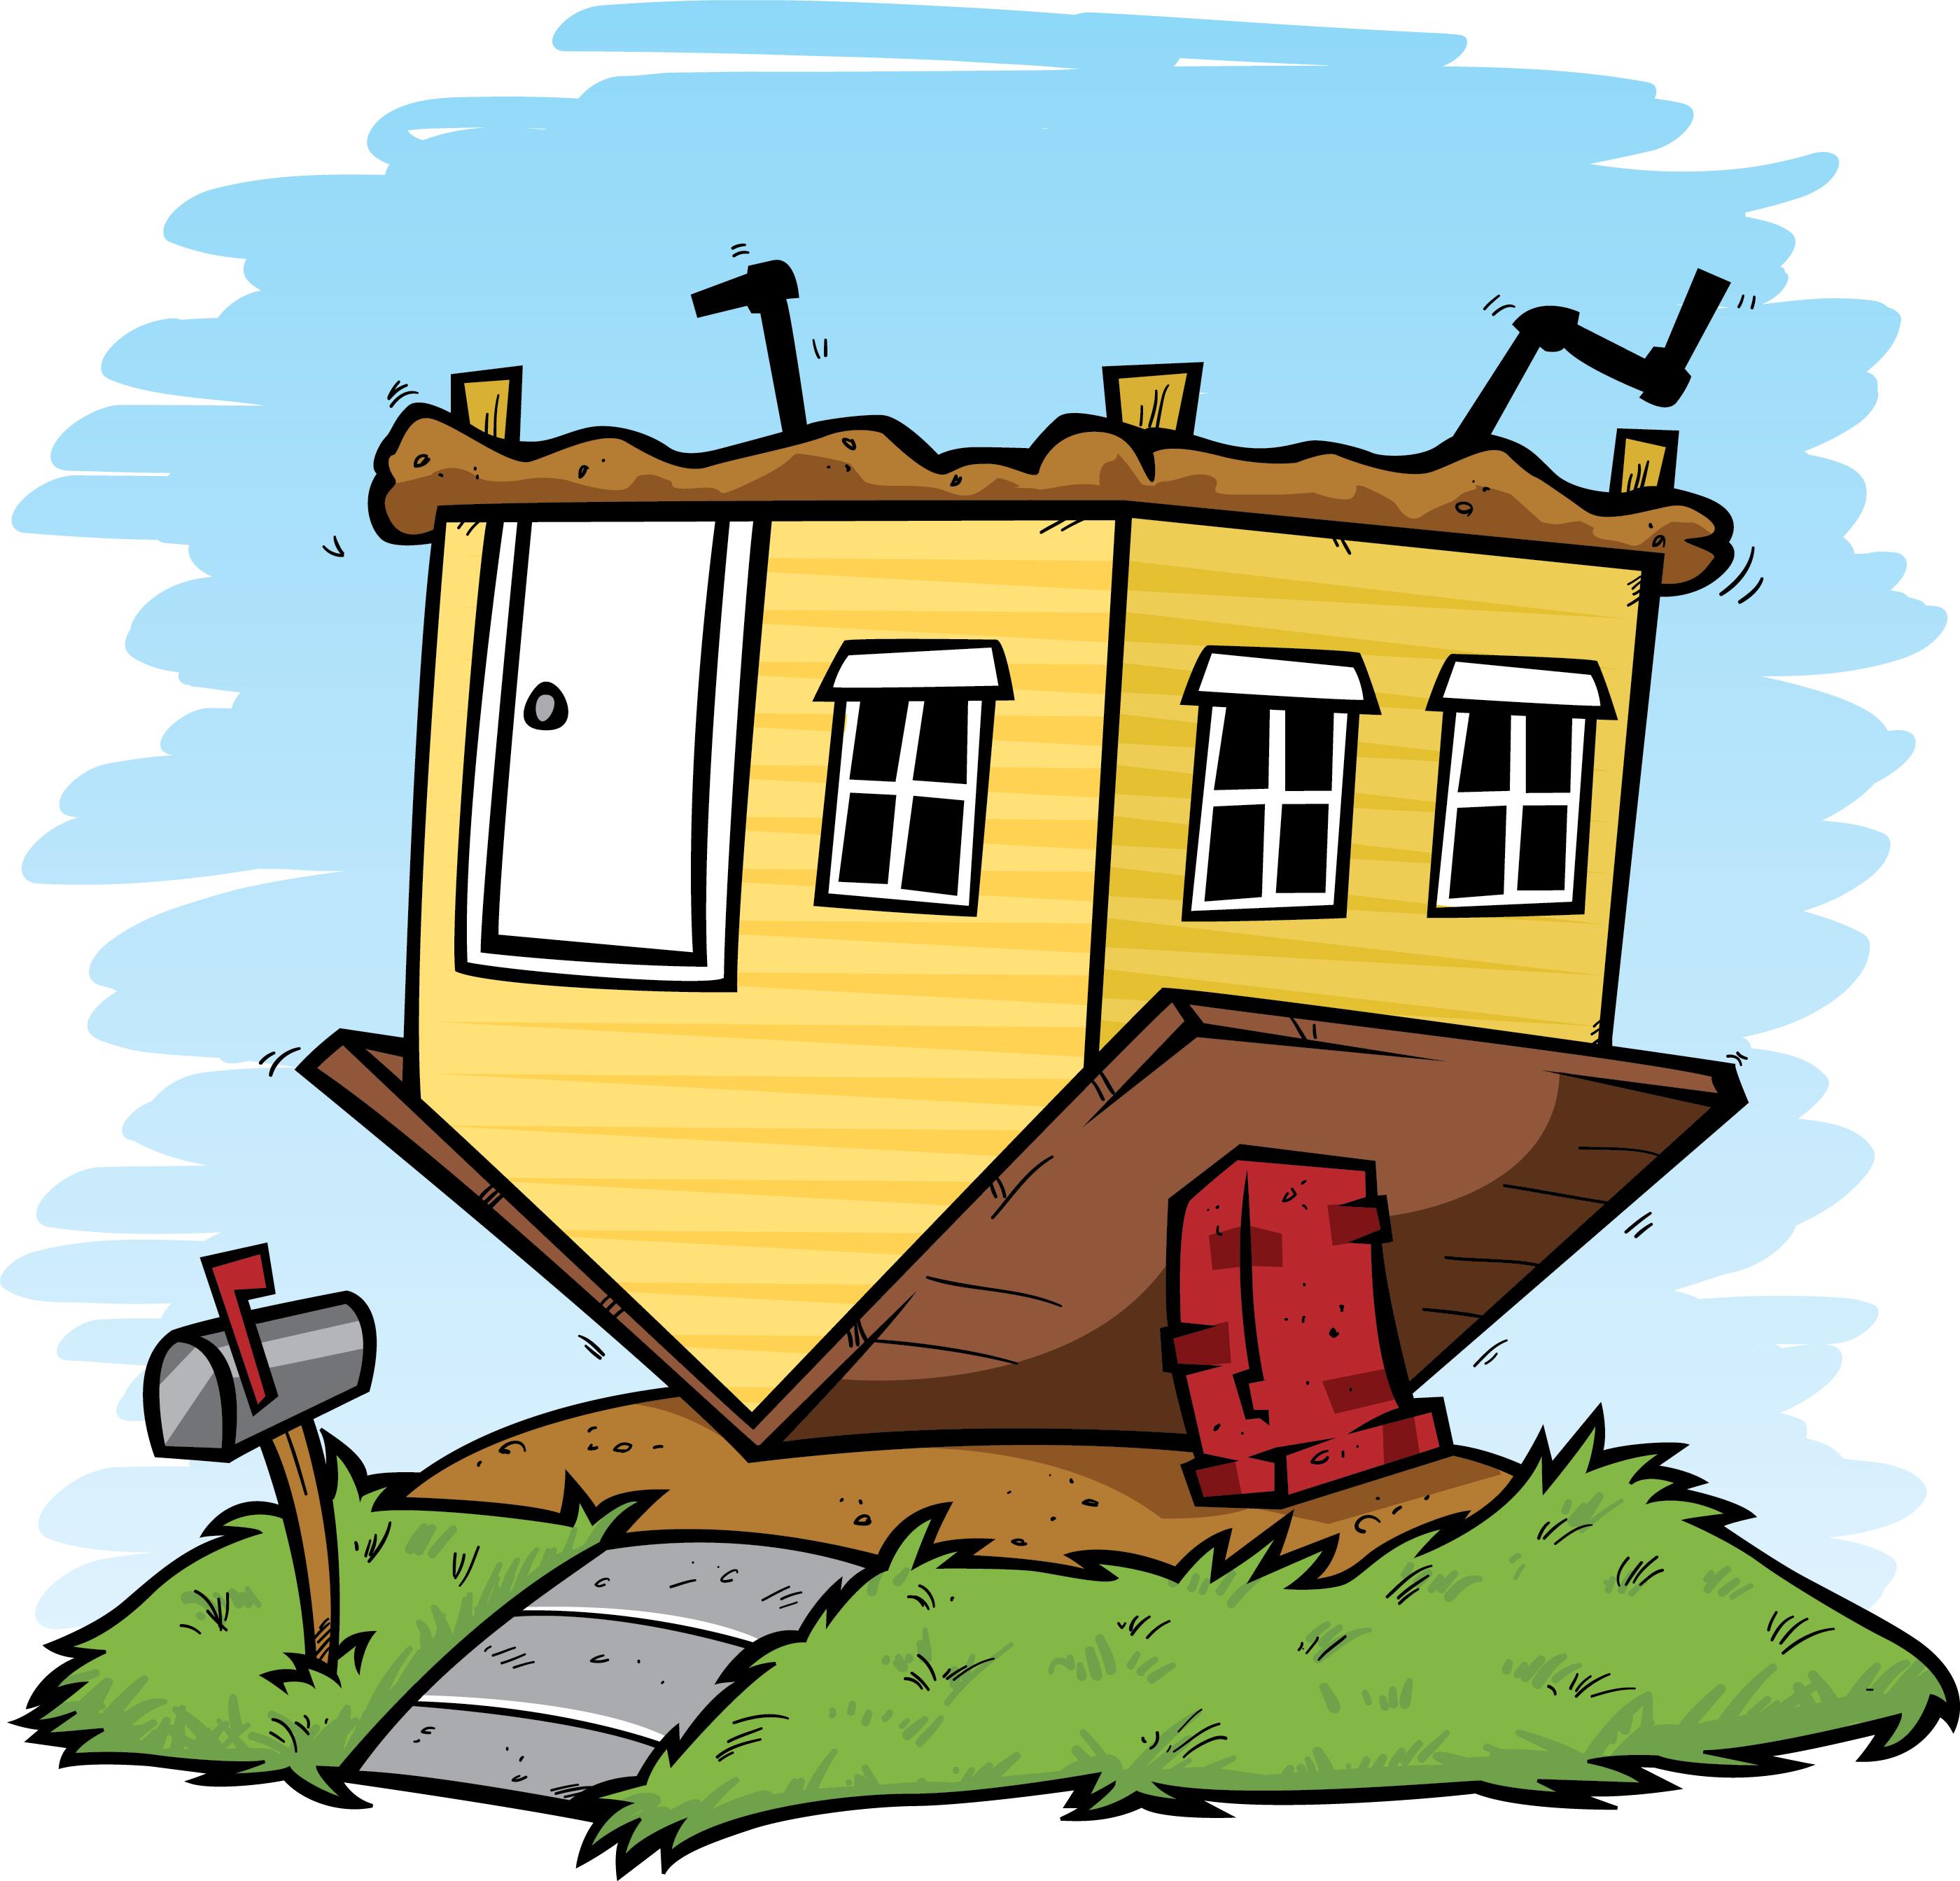 Top 5 Los Angeles Homebuyer Mistakes | Top Los Angeles real estate agent Glenn Shelhamer | Los Angeles houses for sale